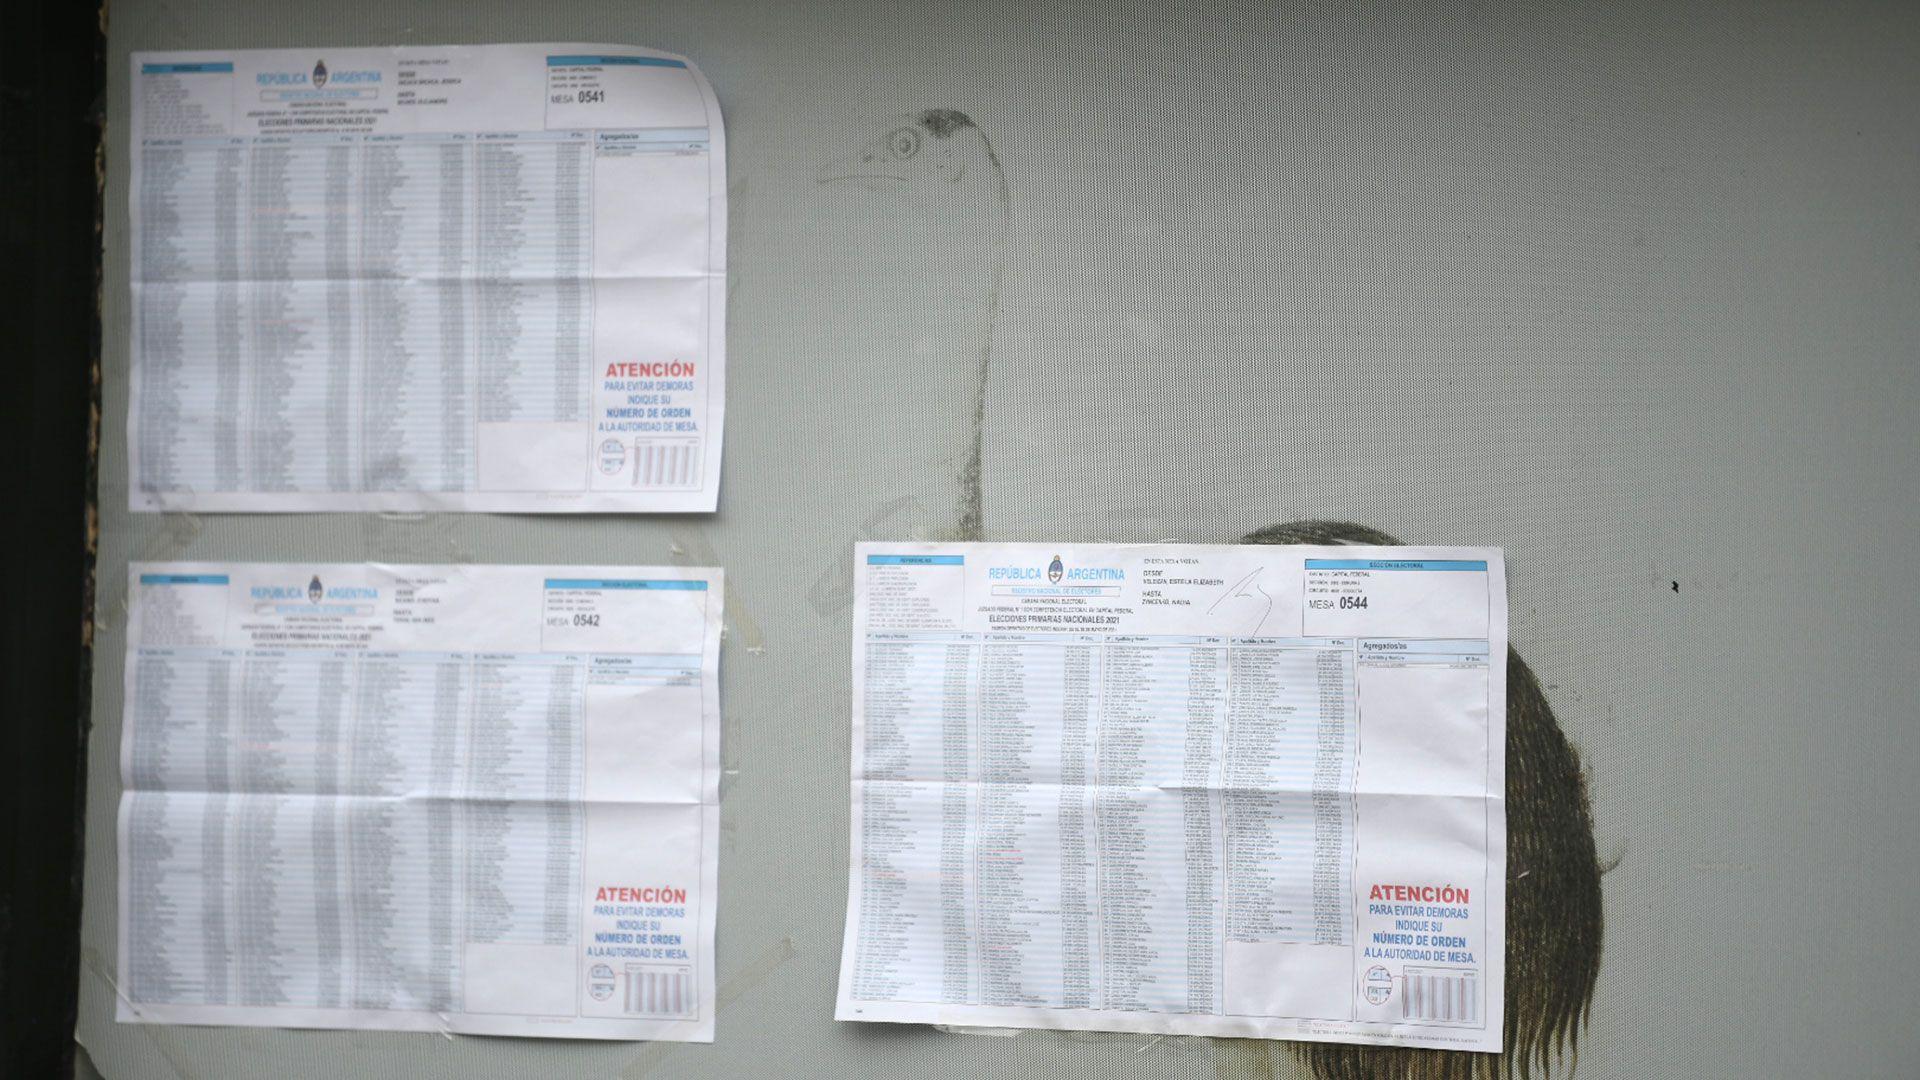 escuela-vota-maria-eugenia-vidal-elecciones-legislativas-paso-2021 padrones